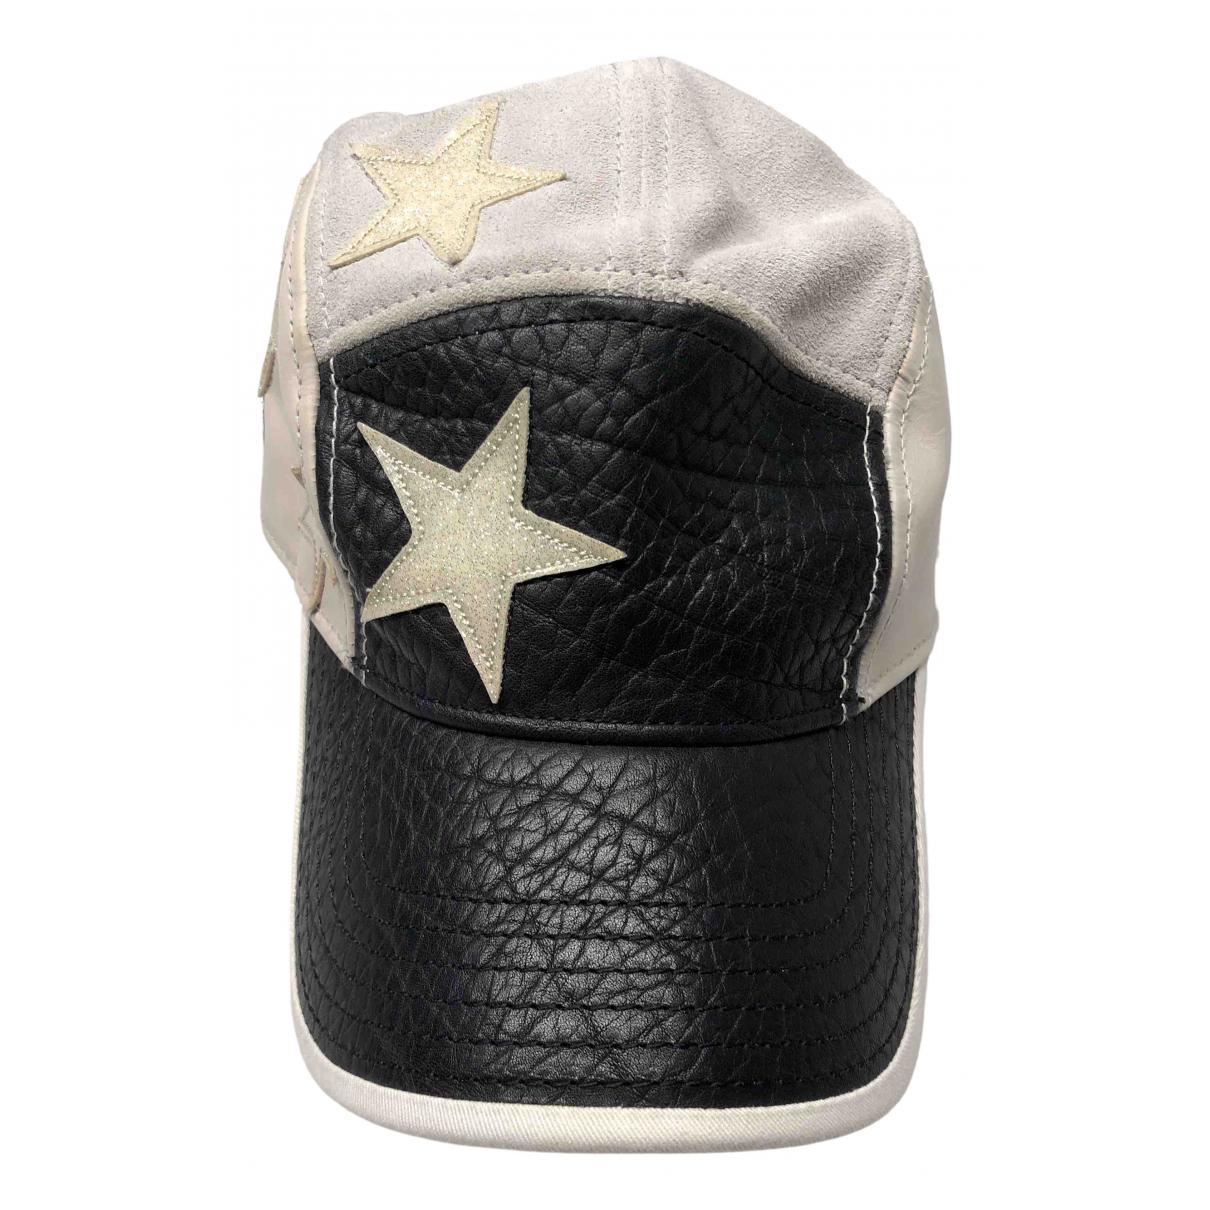 Acne Studios N Grey Leather hat for Women M International